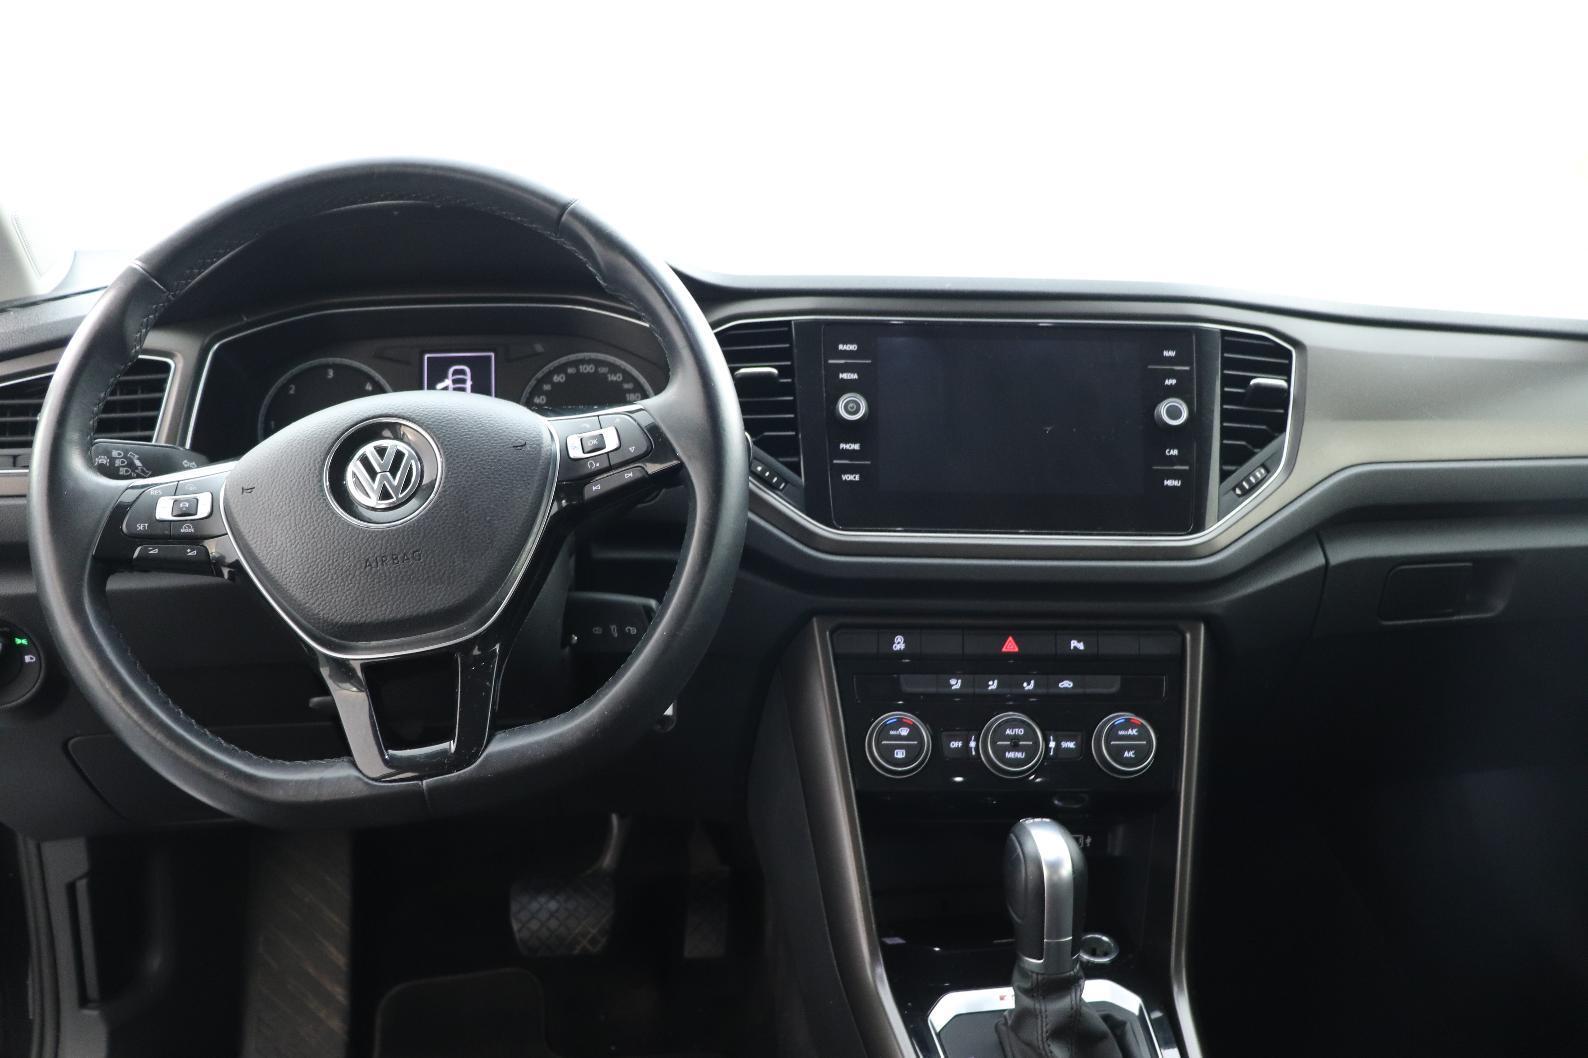 VOLKSWAGEN T-roc 2.0 TDI 150 Start/Stop DSG7 4Motion IQ.Drive